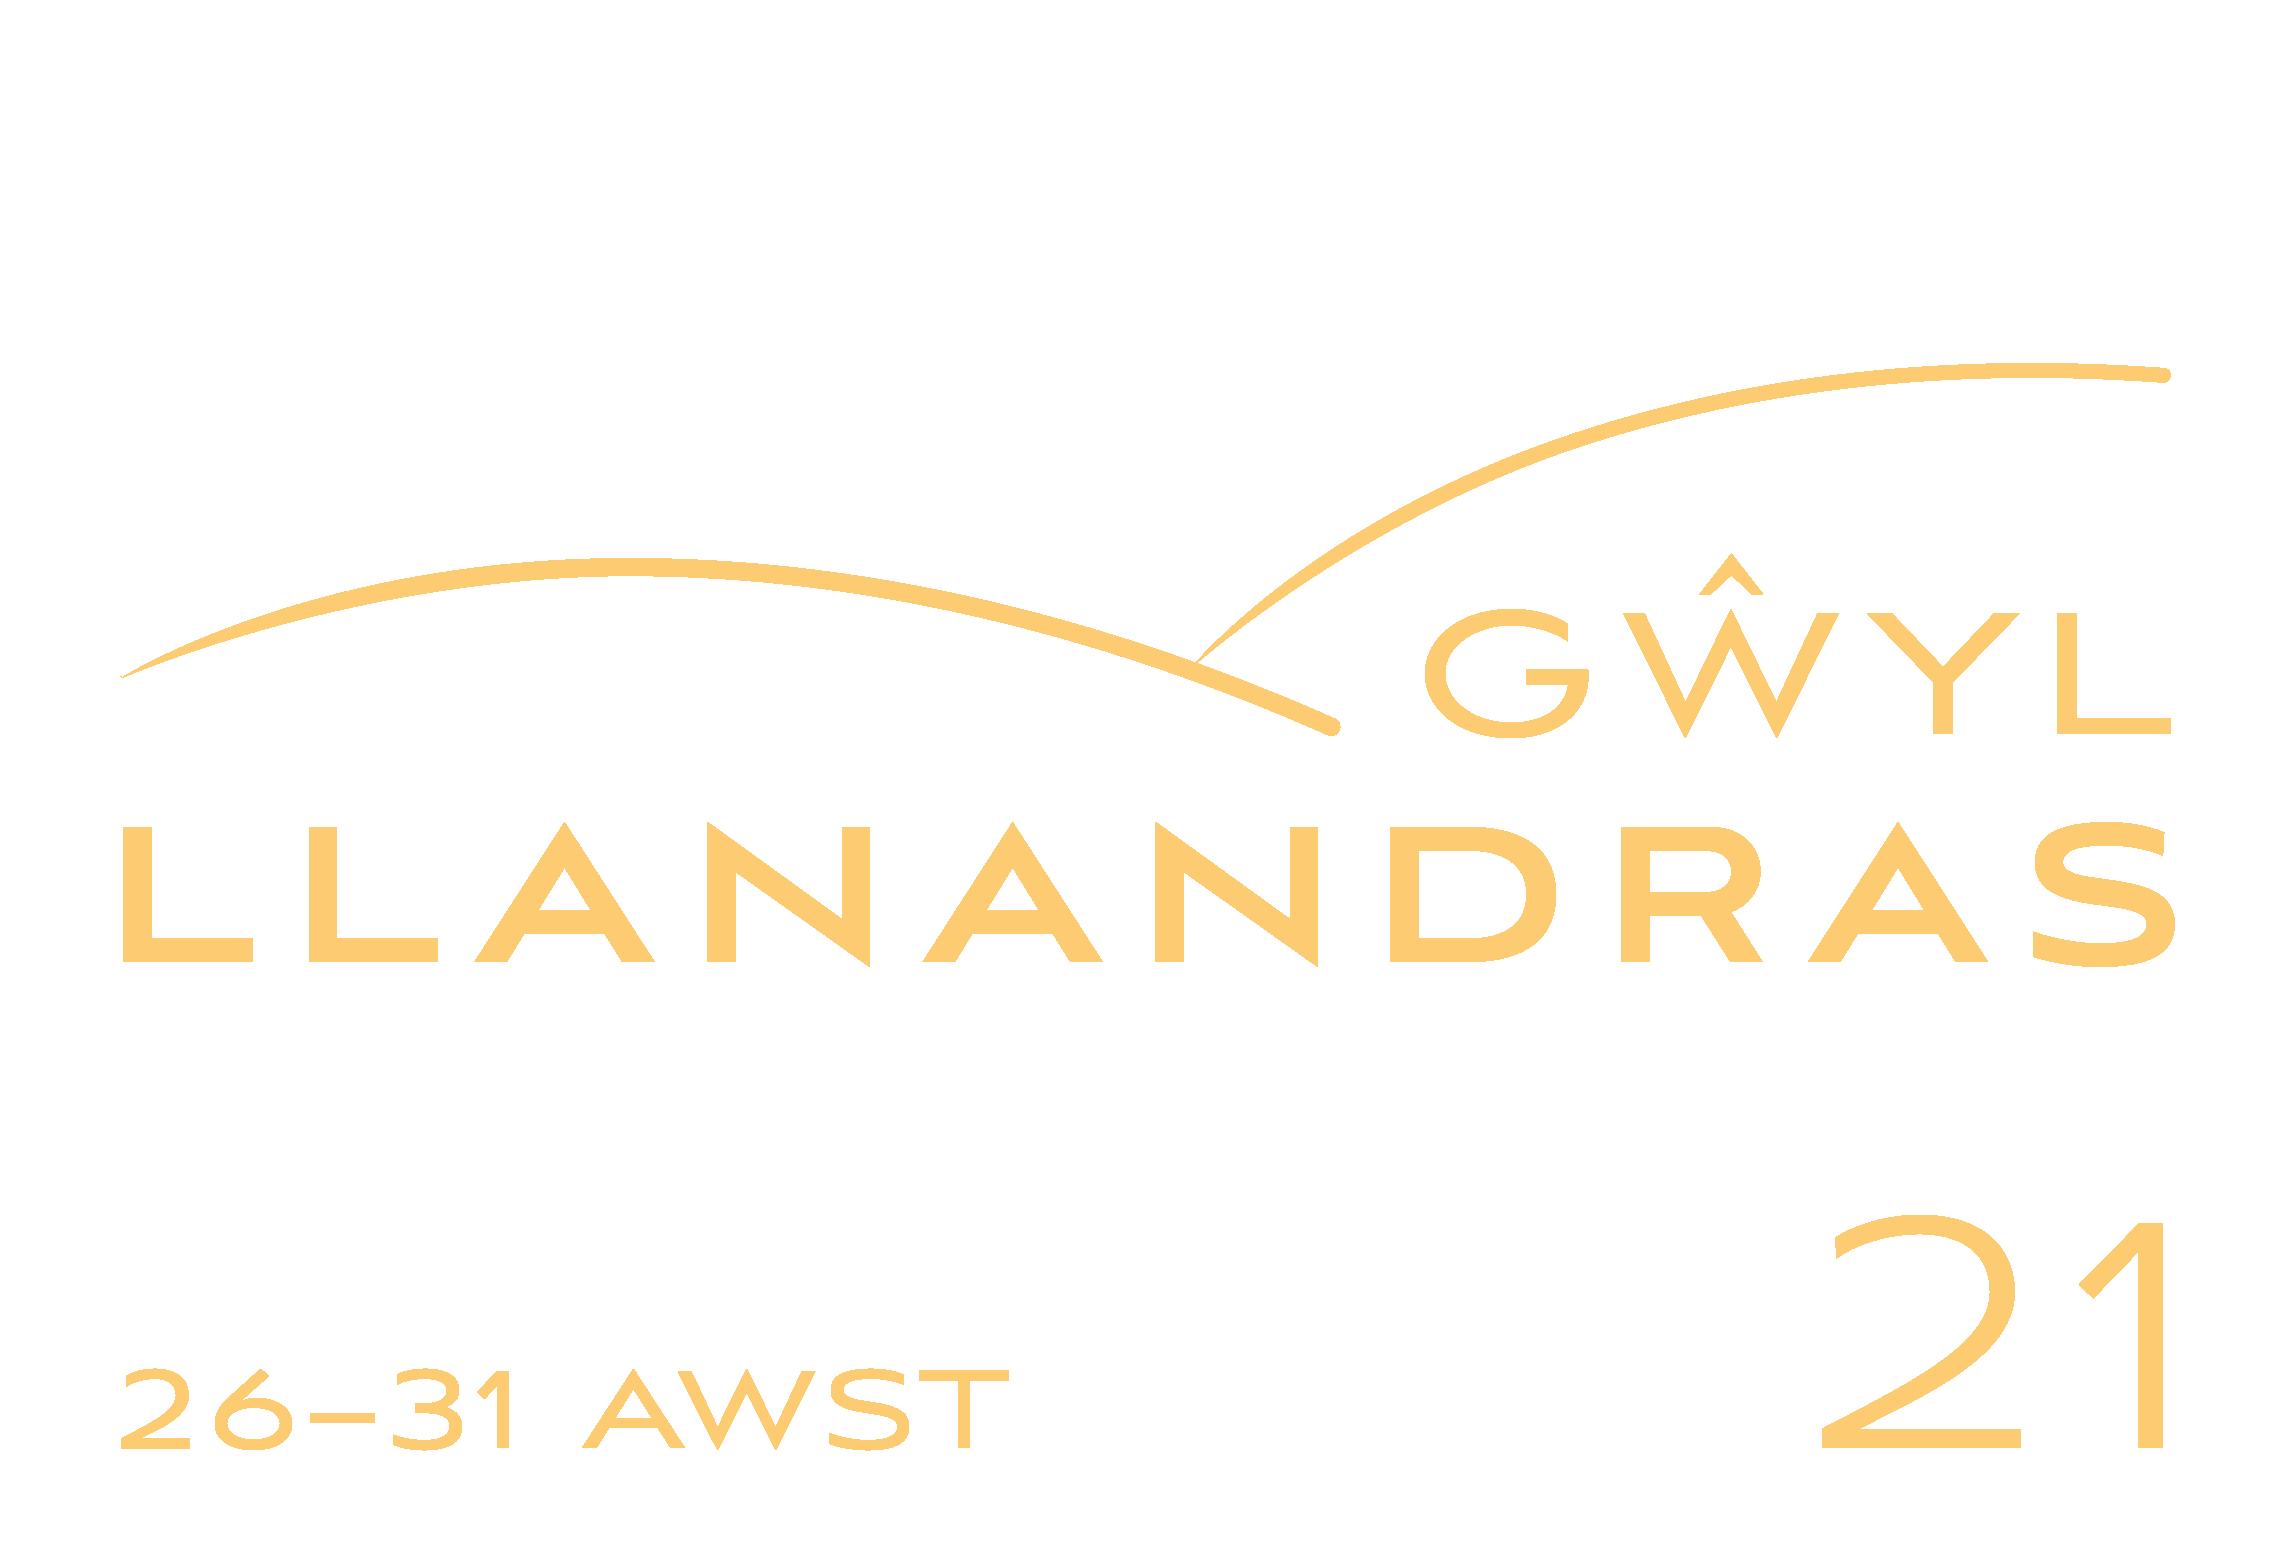 Presteigne Festival of Music and the Arts